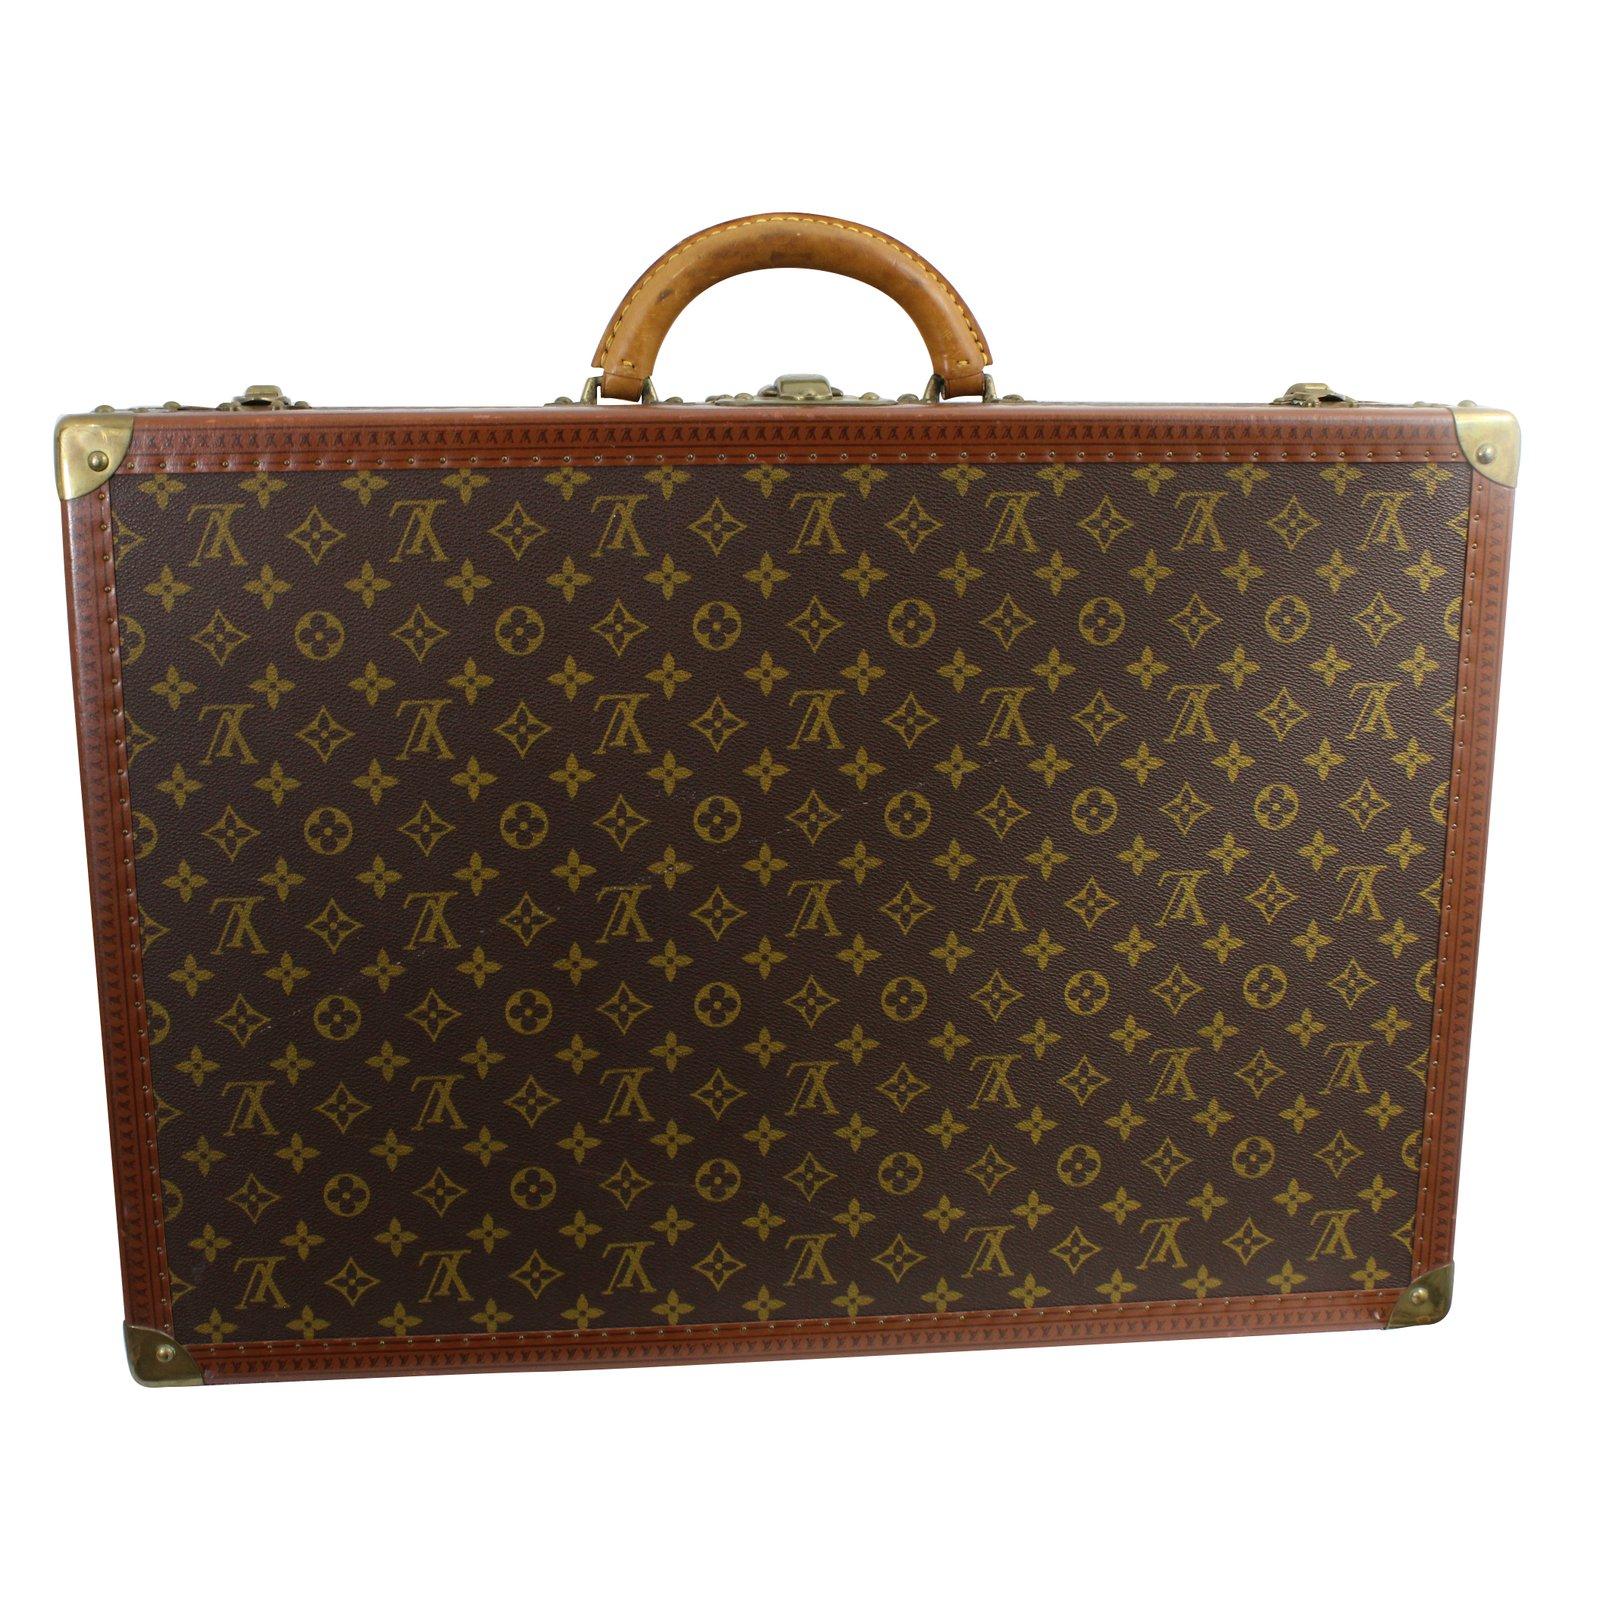 85e429c06 Louis Vuitton Travel Bags Price | The Shred Centre